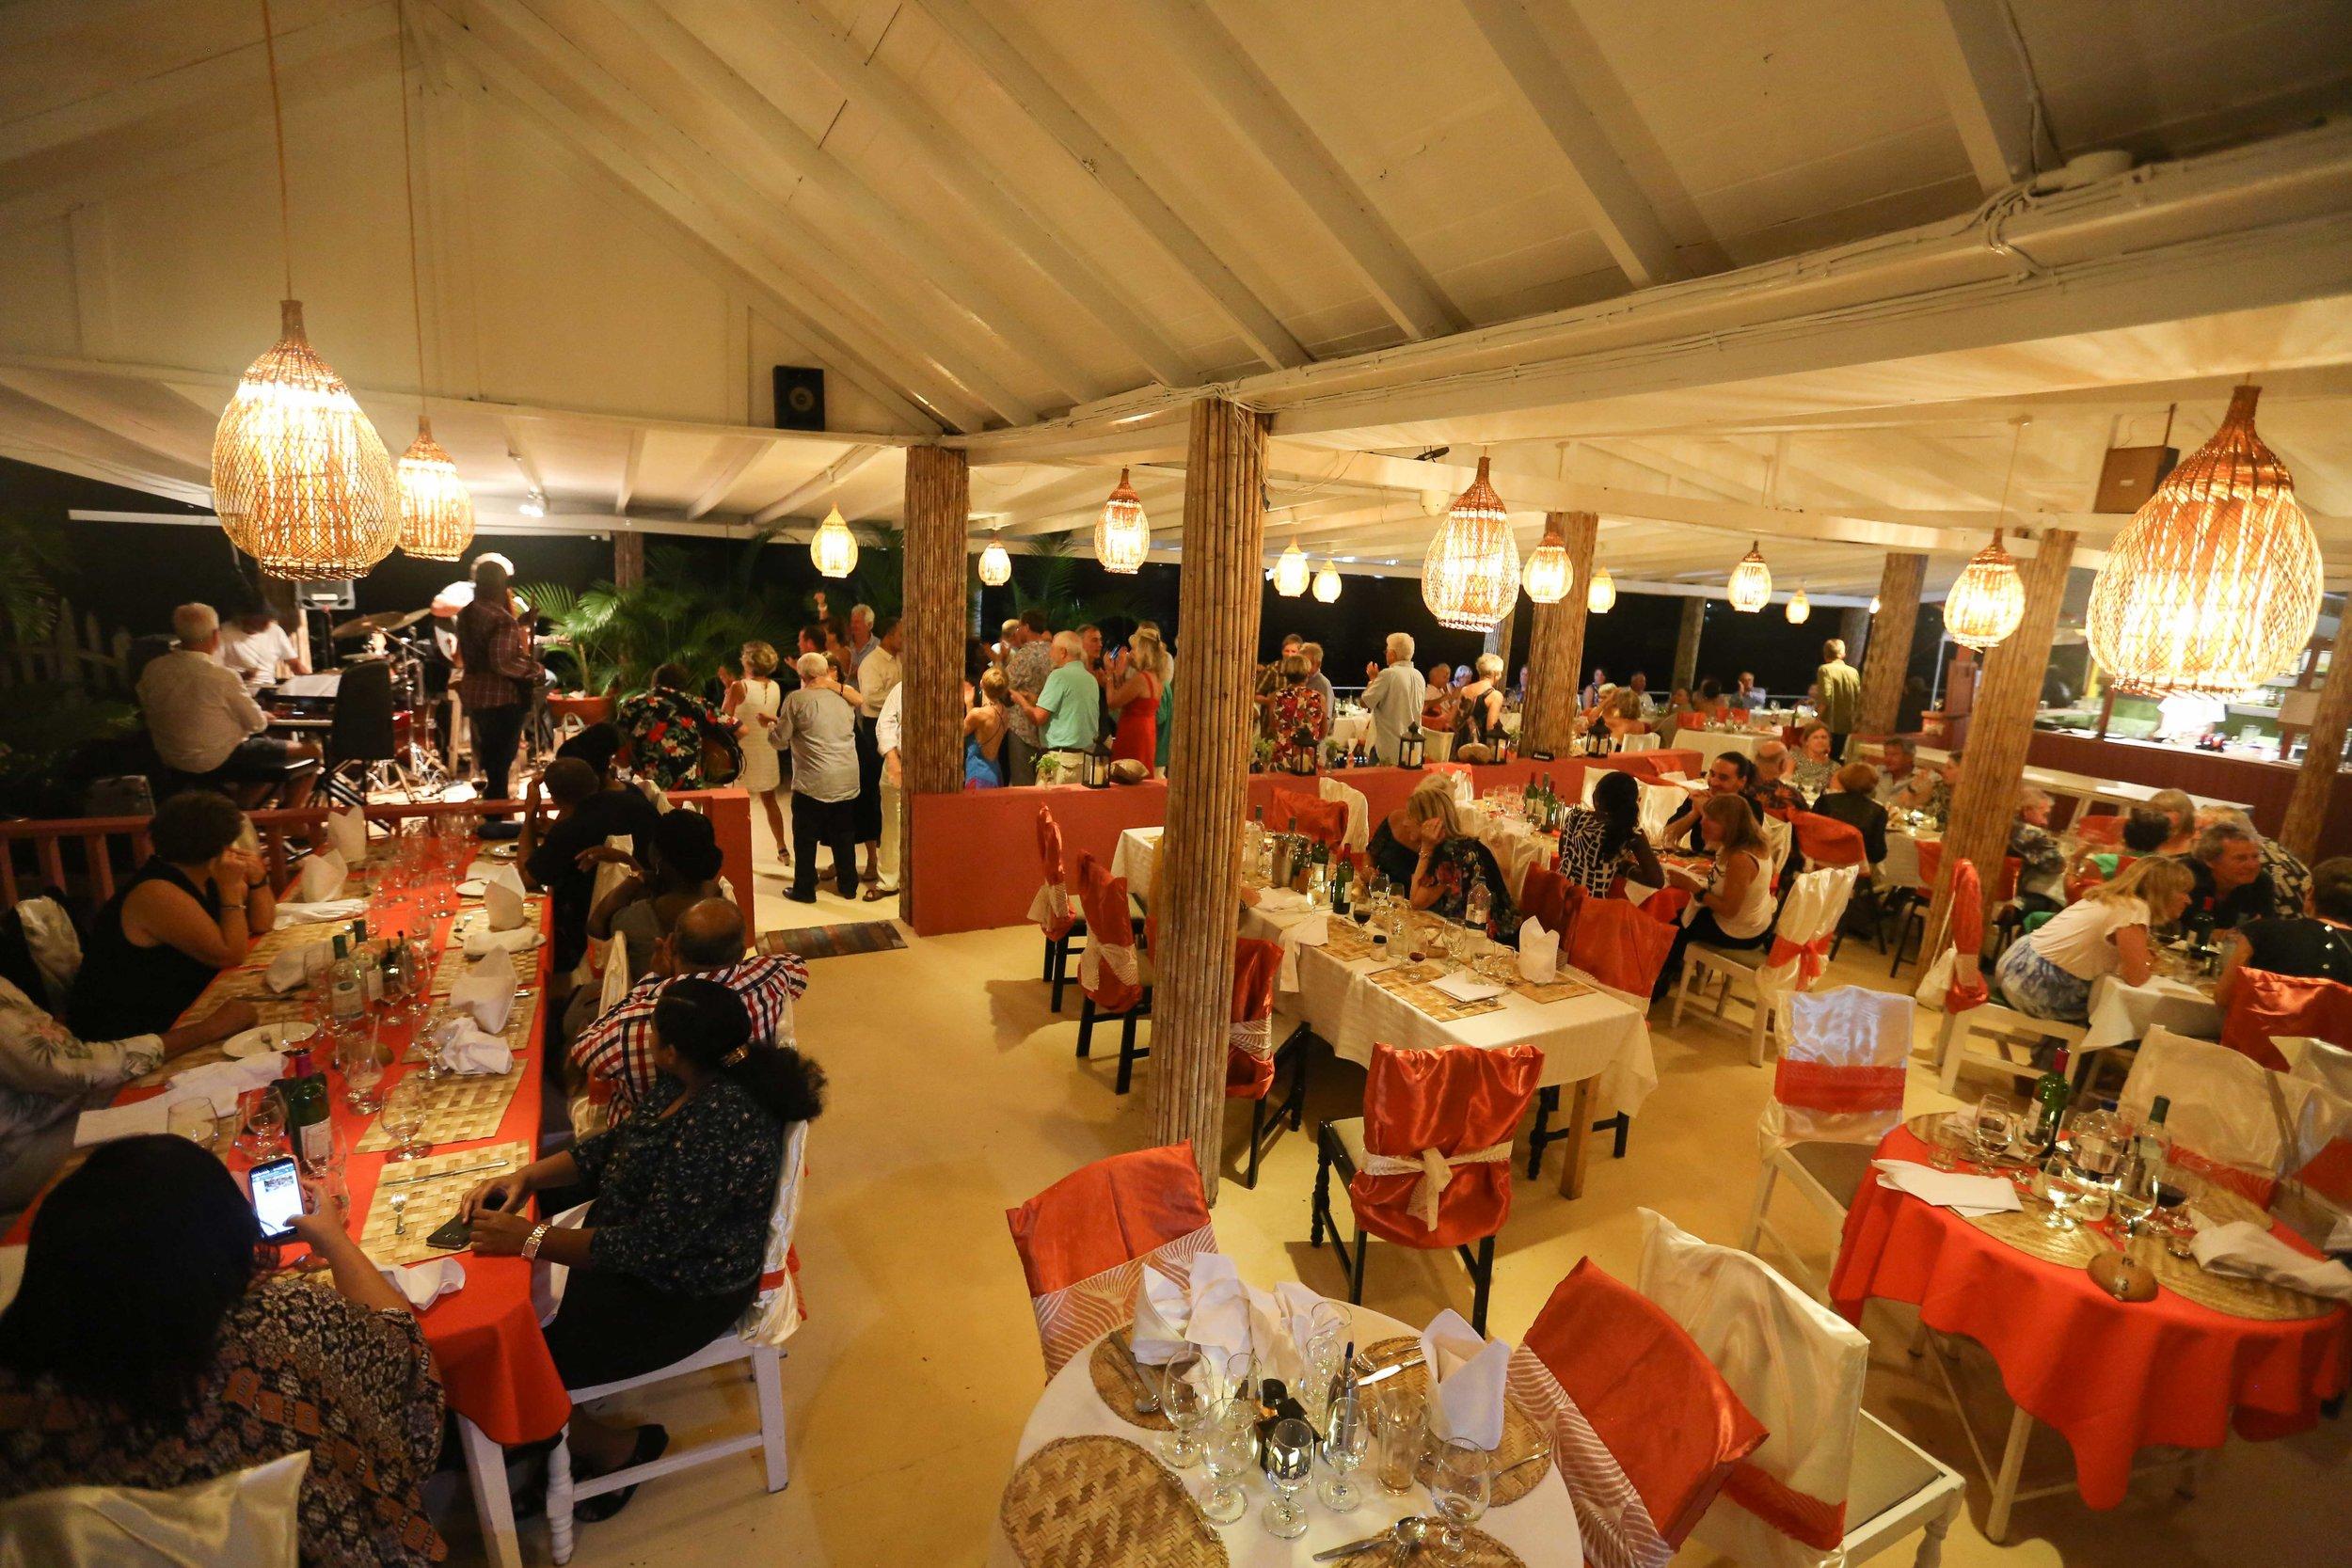 The Fig Tree Restaurant & Bar